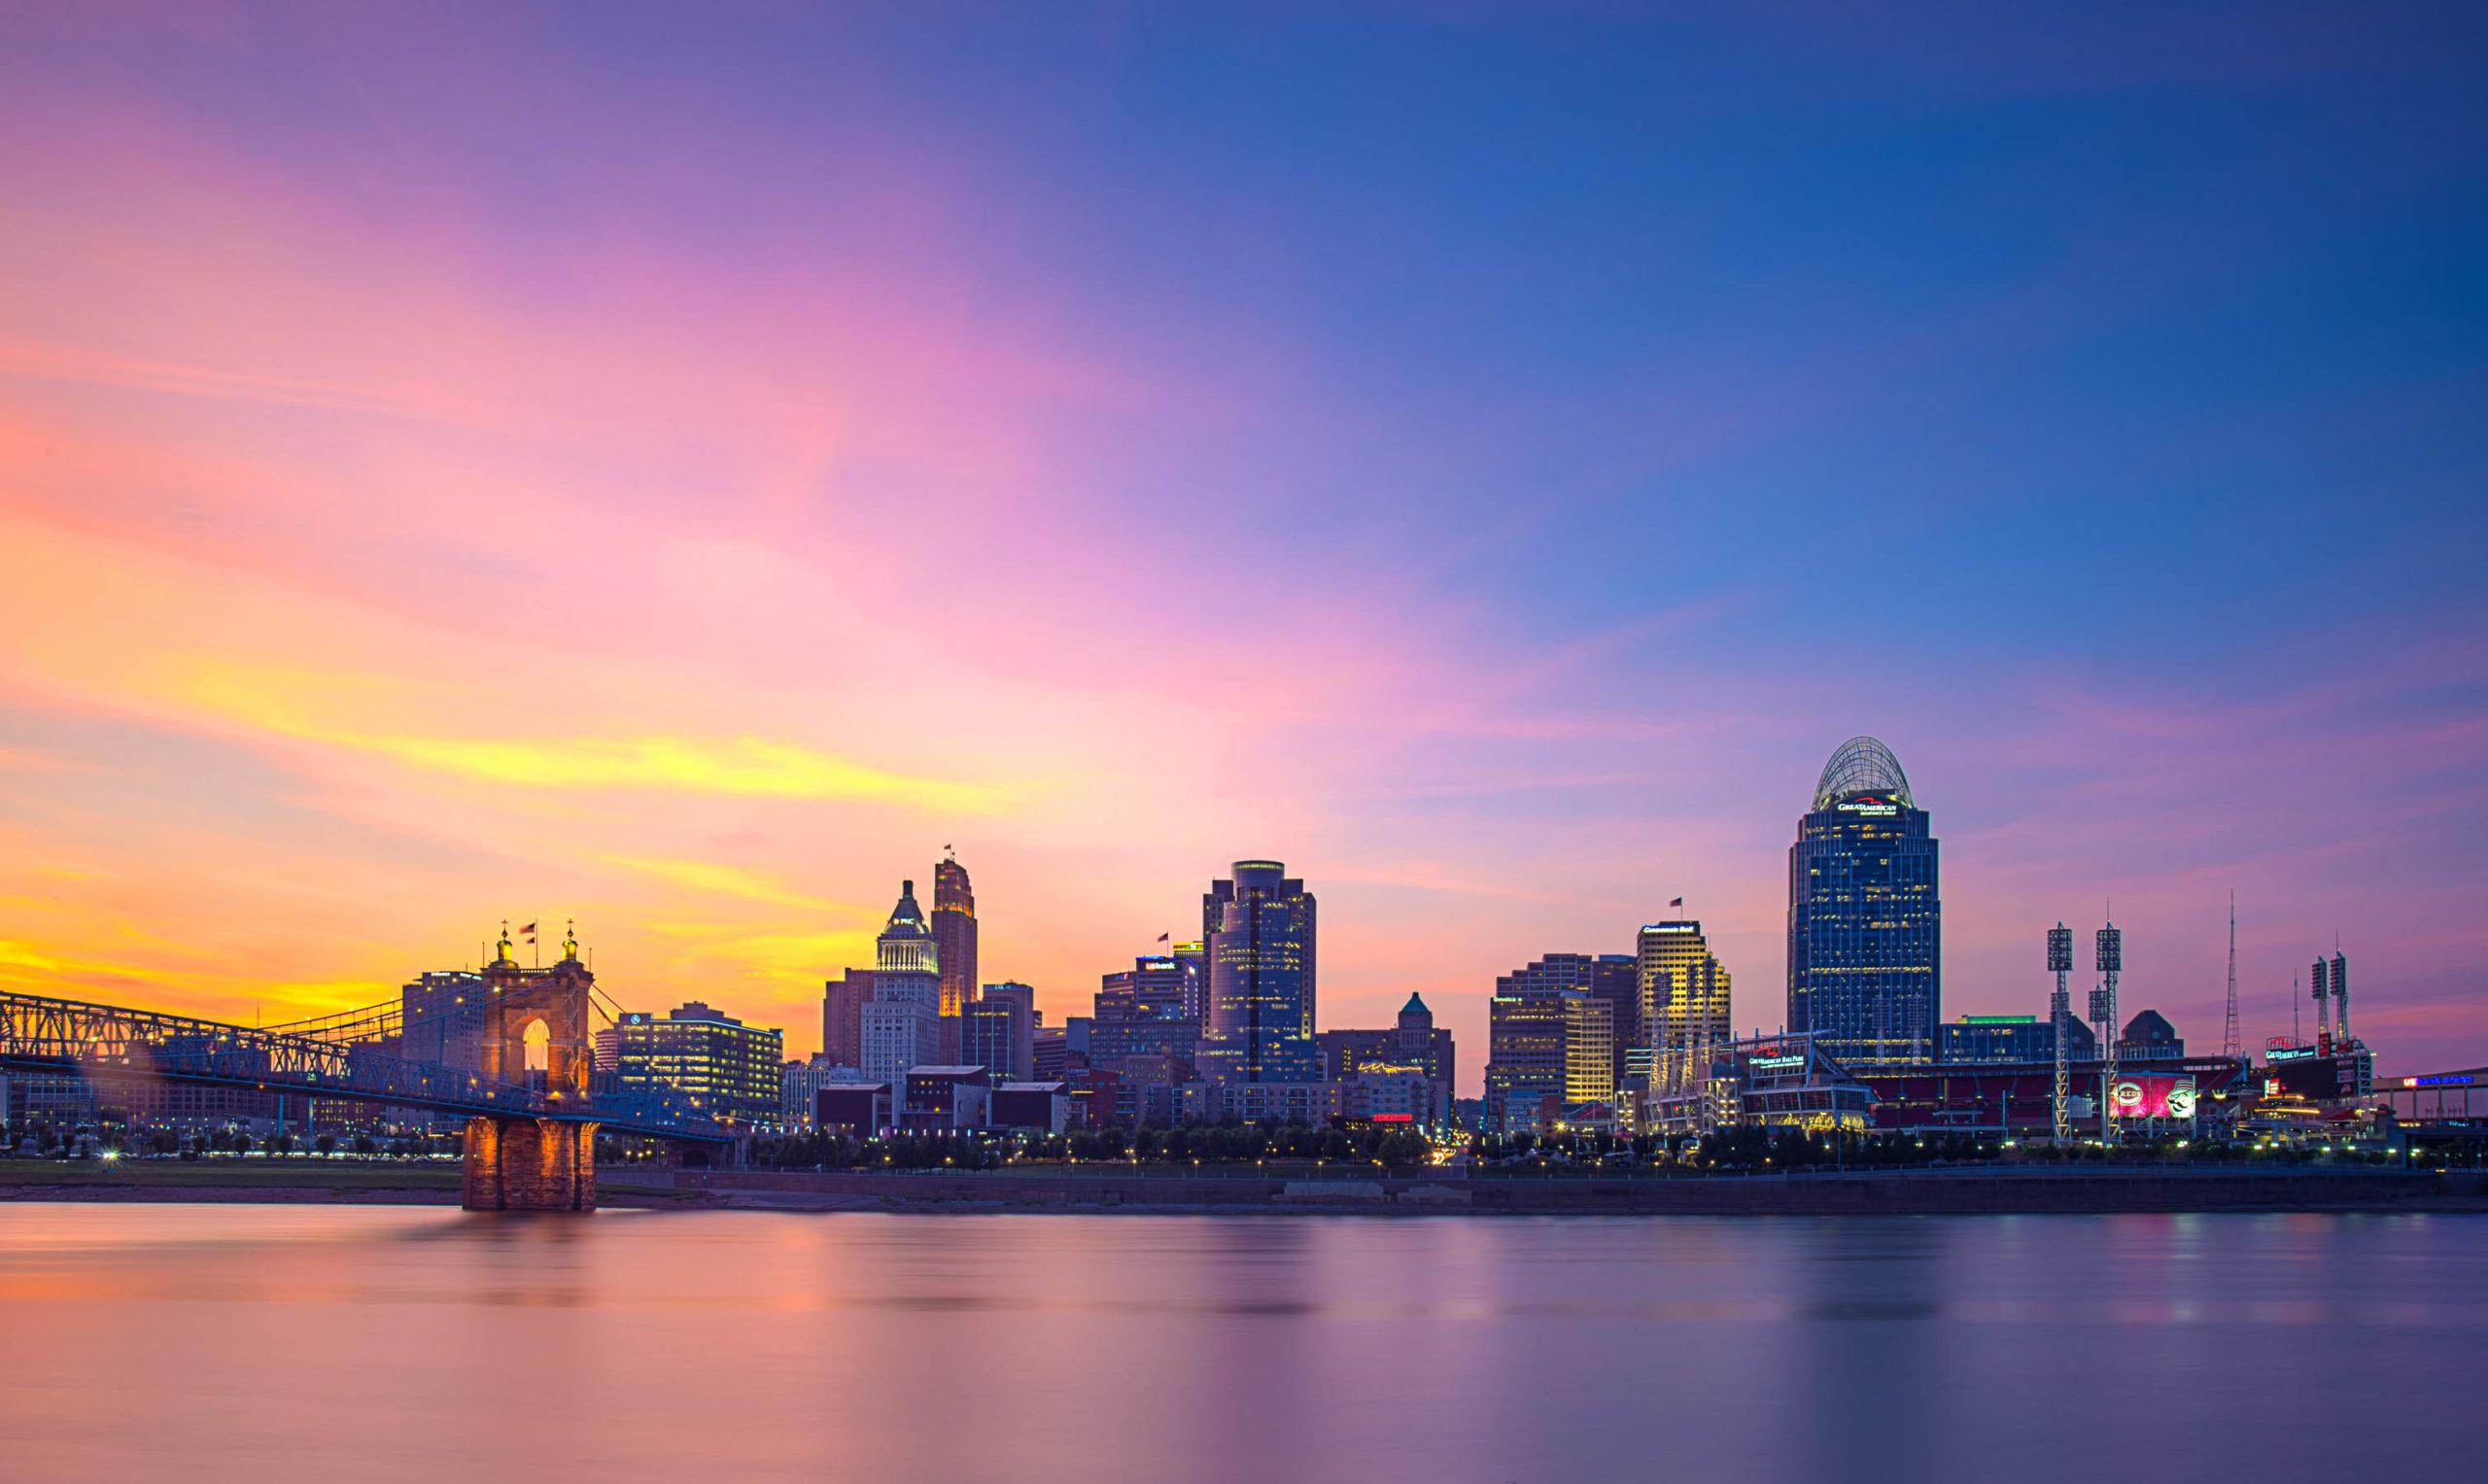 Sunset in Ohio River Cincinnati